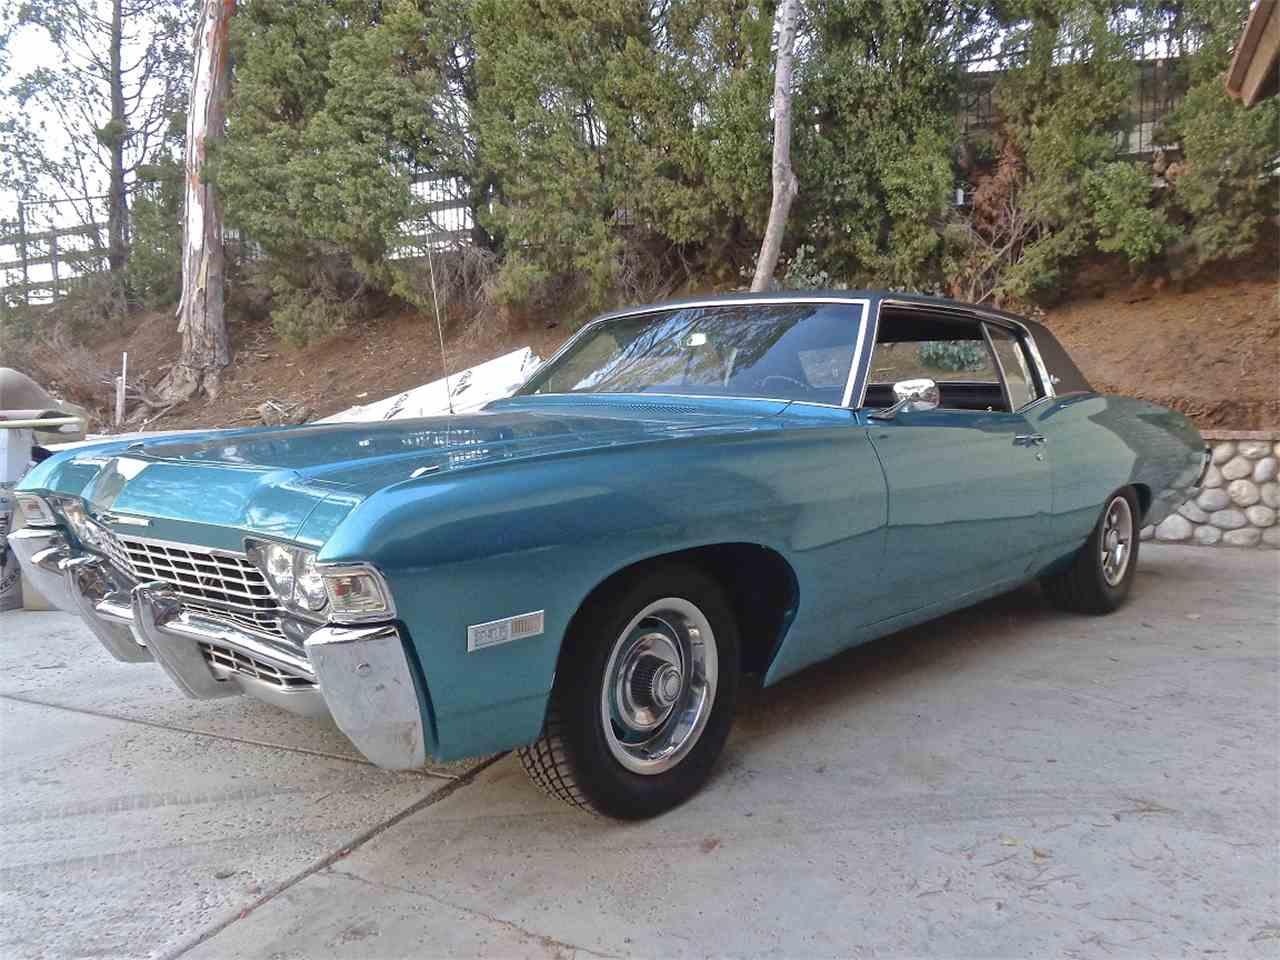 1968 Chevrolet Caprice for Sale | ClassicCars.com | CC-1005486